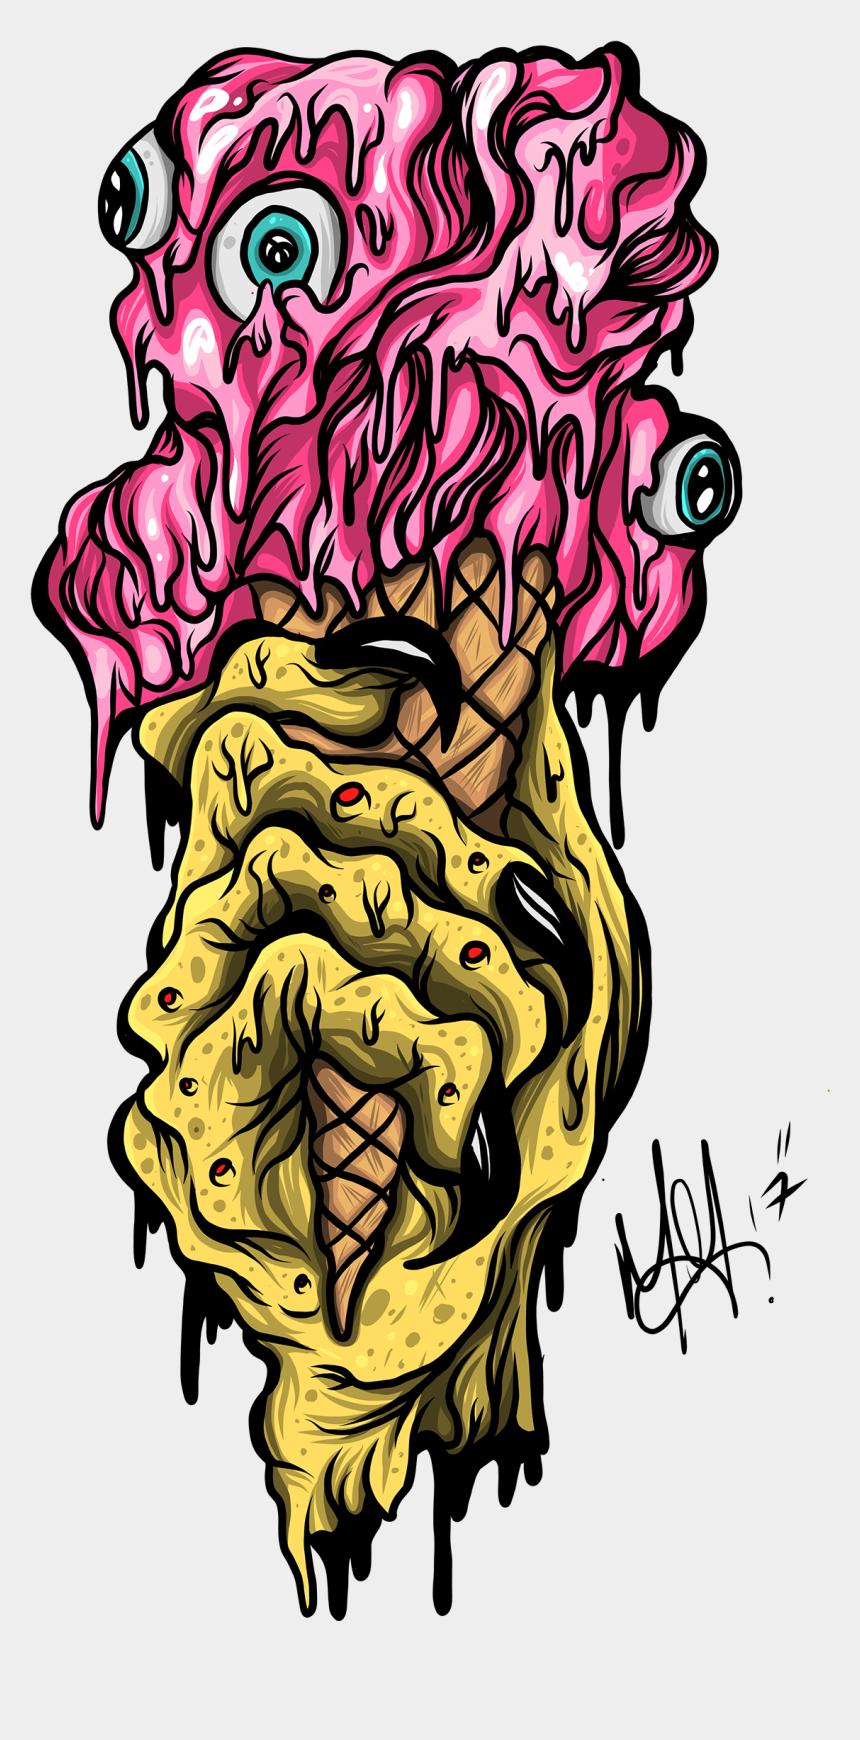 zombie head clipart, Cartoons - Zombie Clipart Ice Cream - Illustration